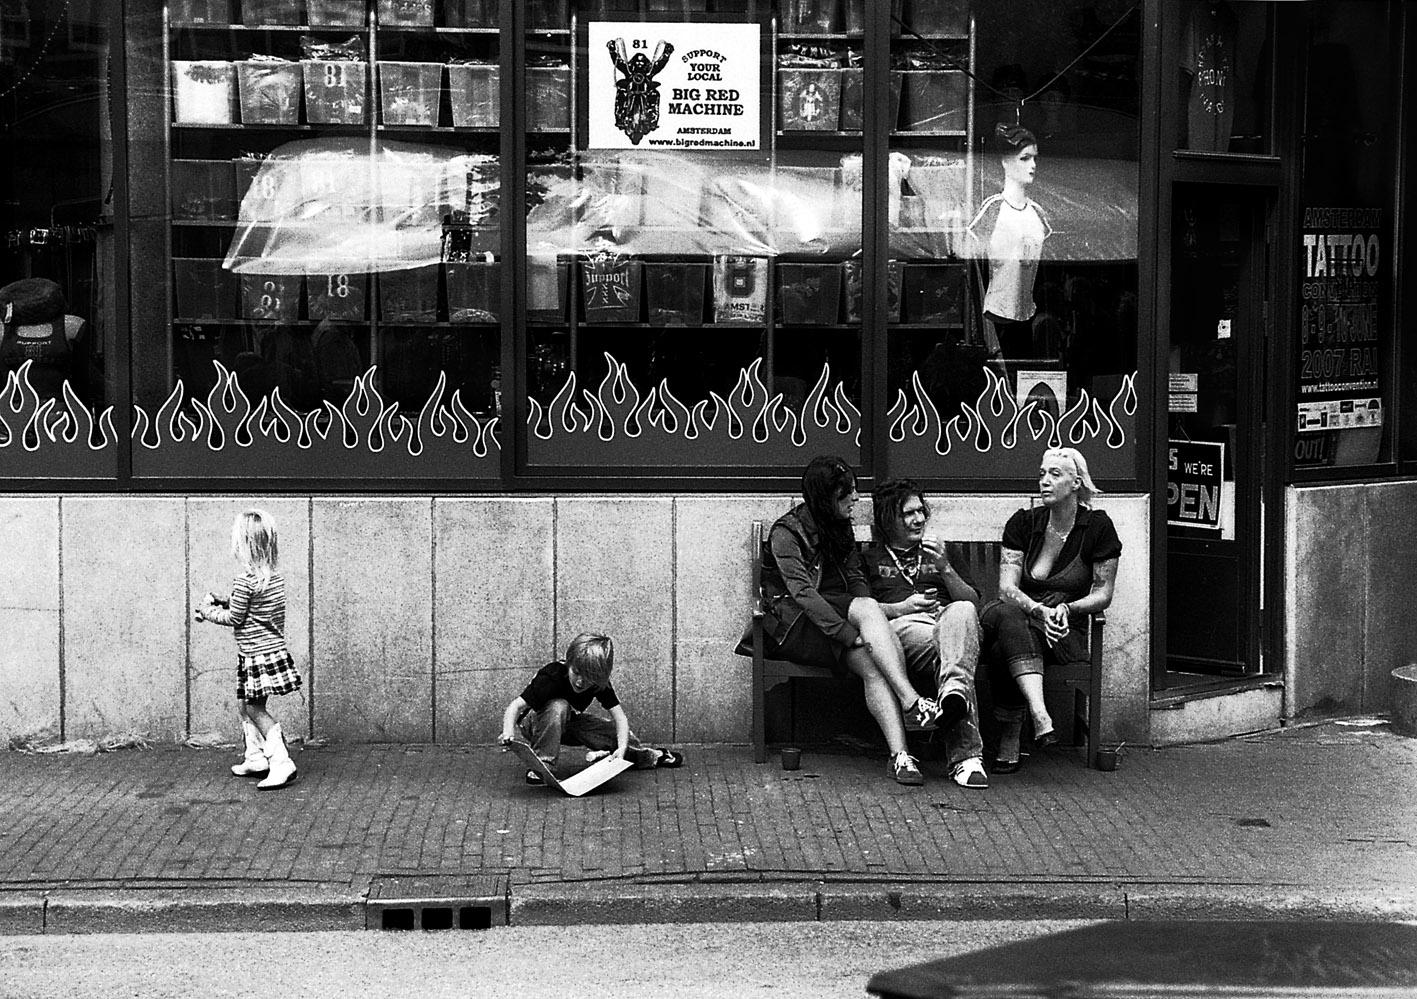 amsterdam029.jpg